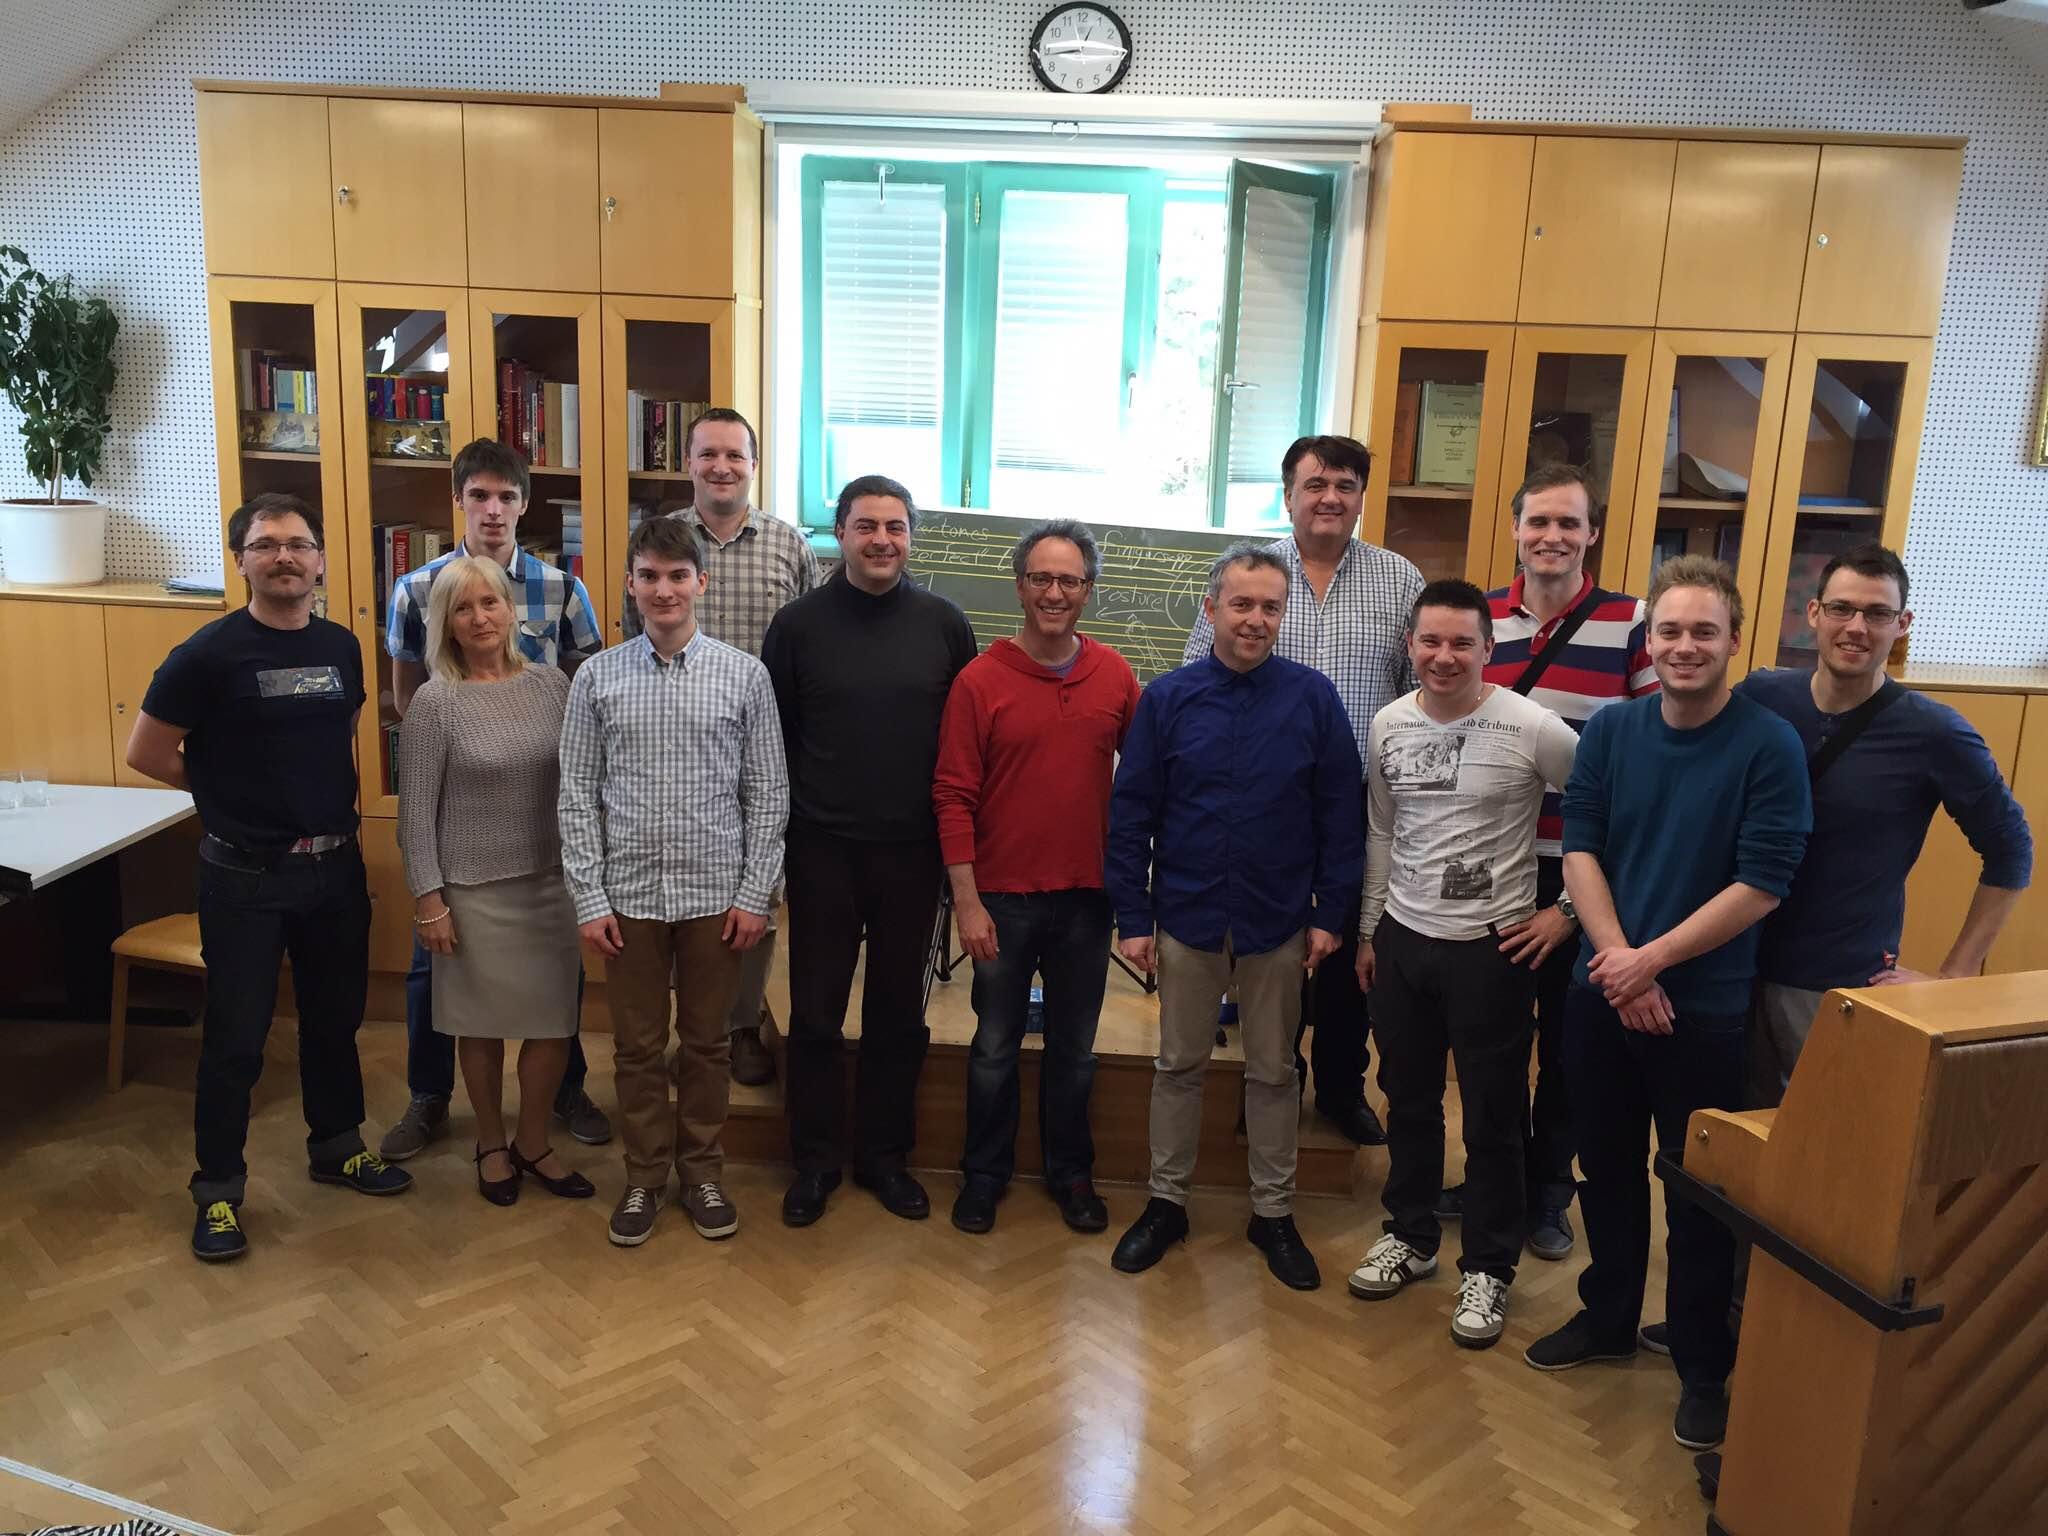 chen-halevi-seminar-10-12-april-2015